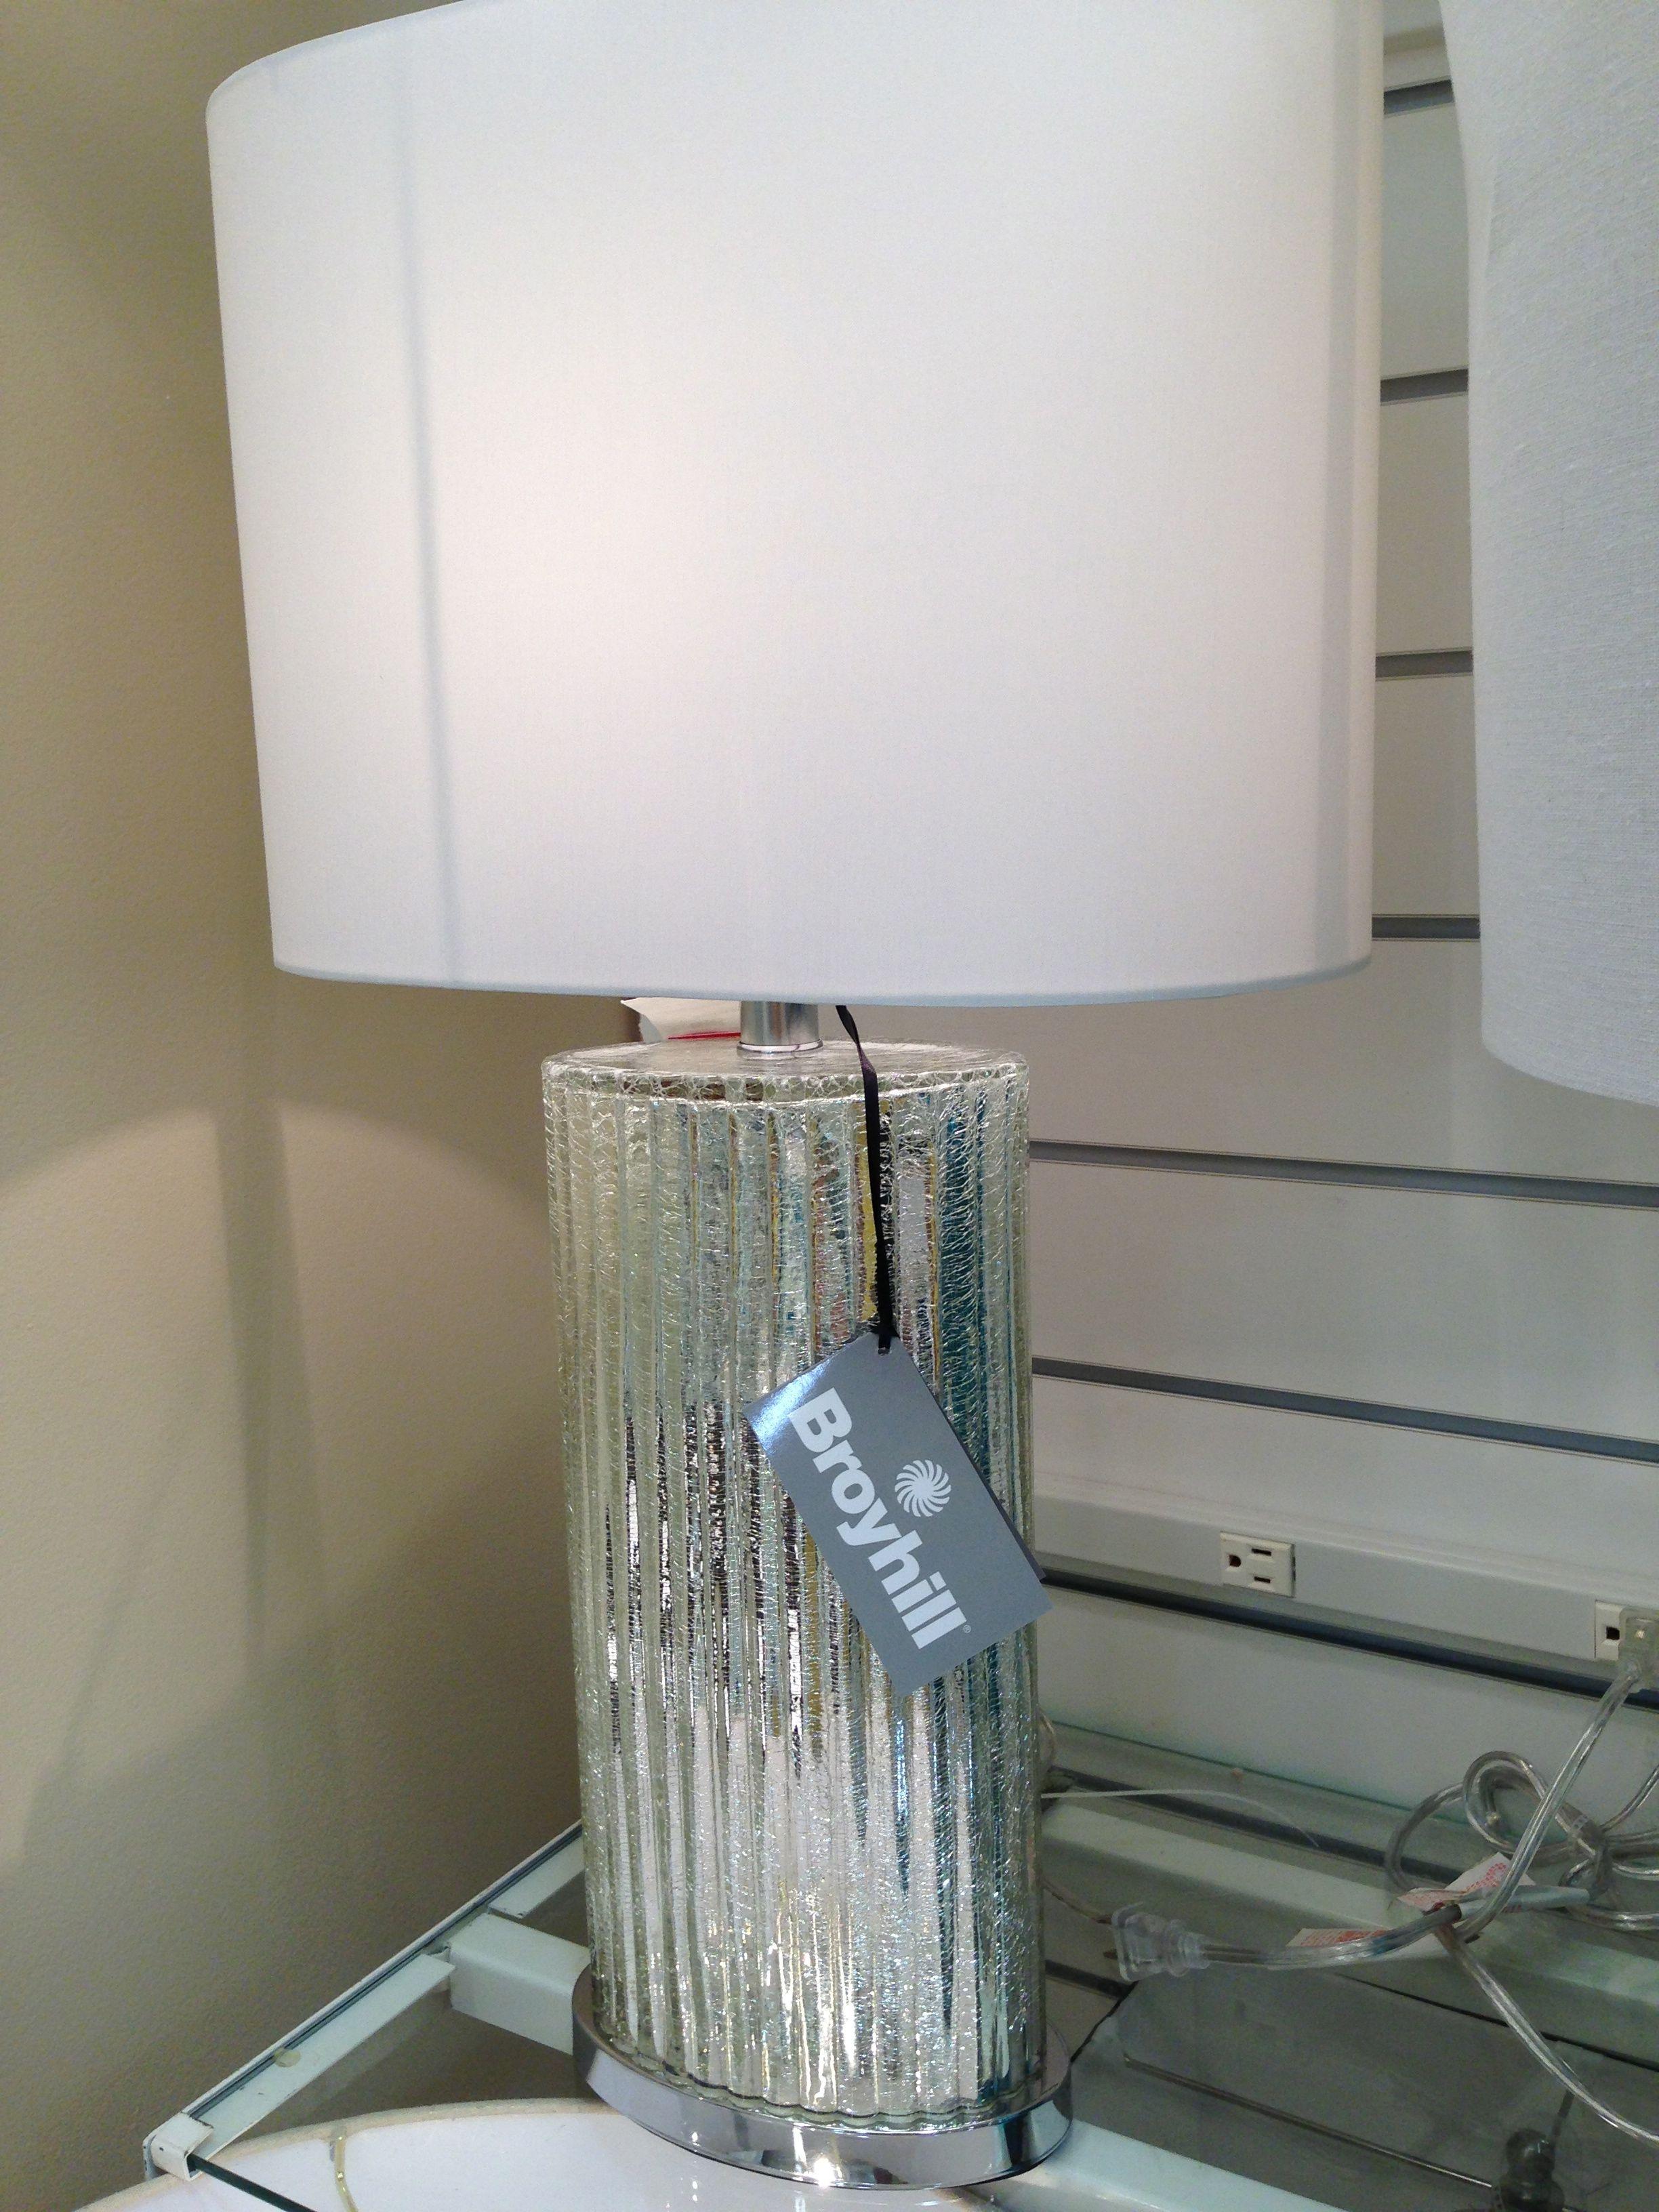 Broyhill Mercury Glass Lamp Lamp Mercury Glass Lamp Glass Lamp